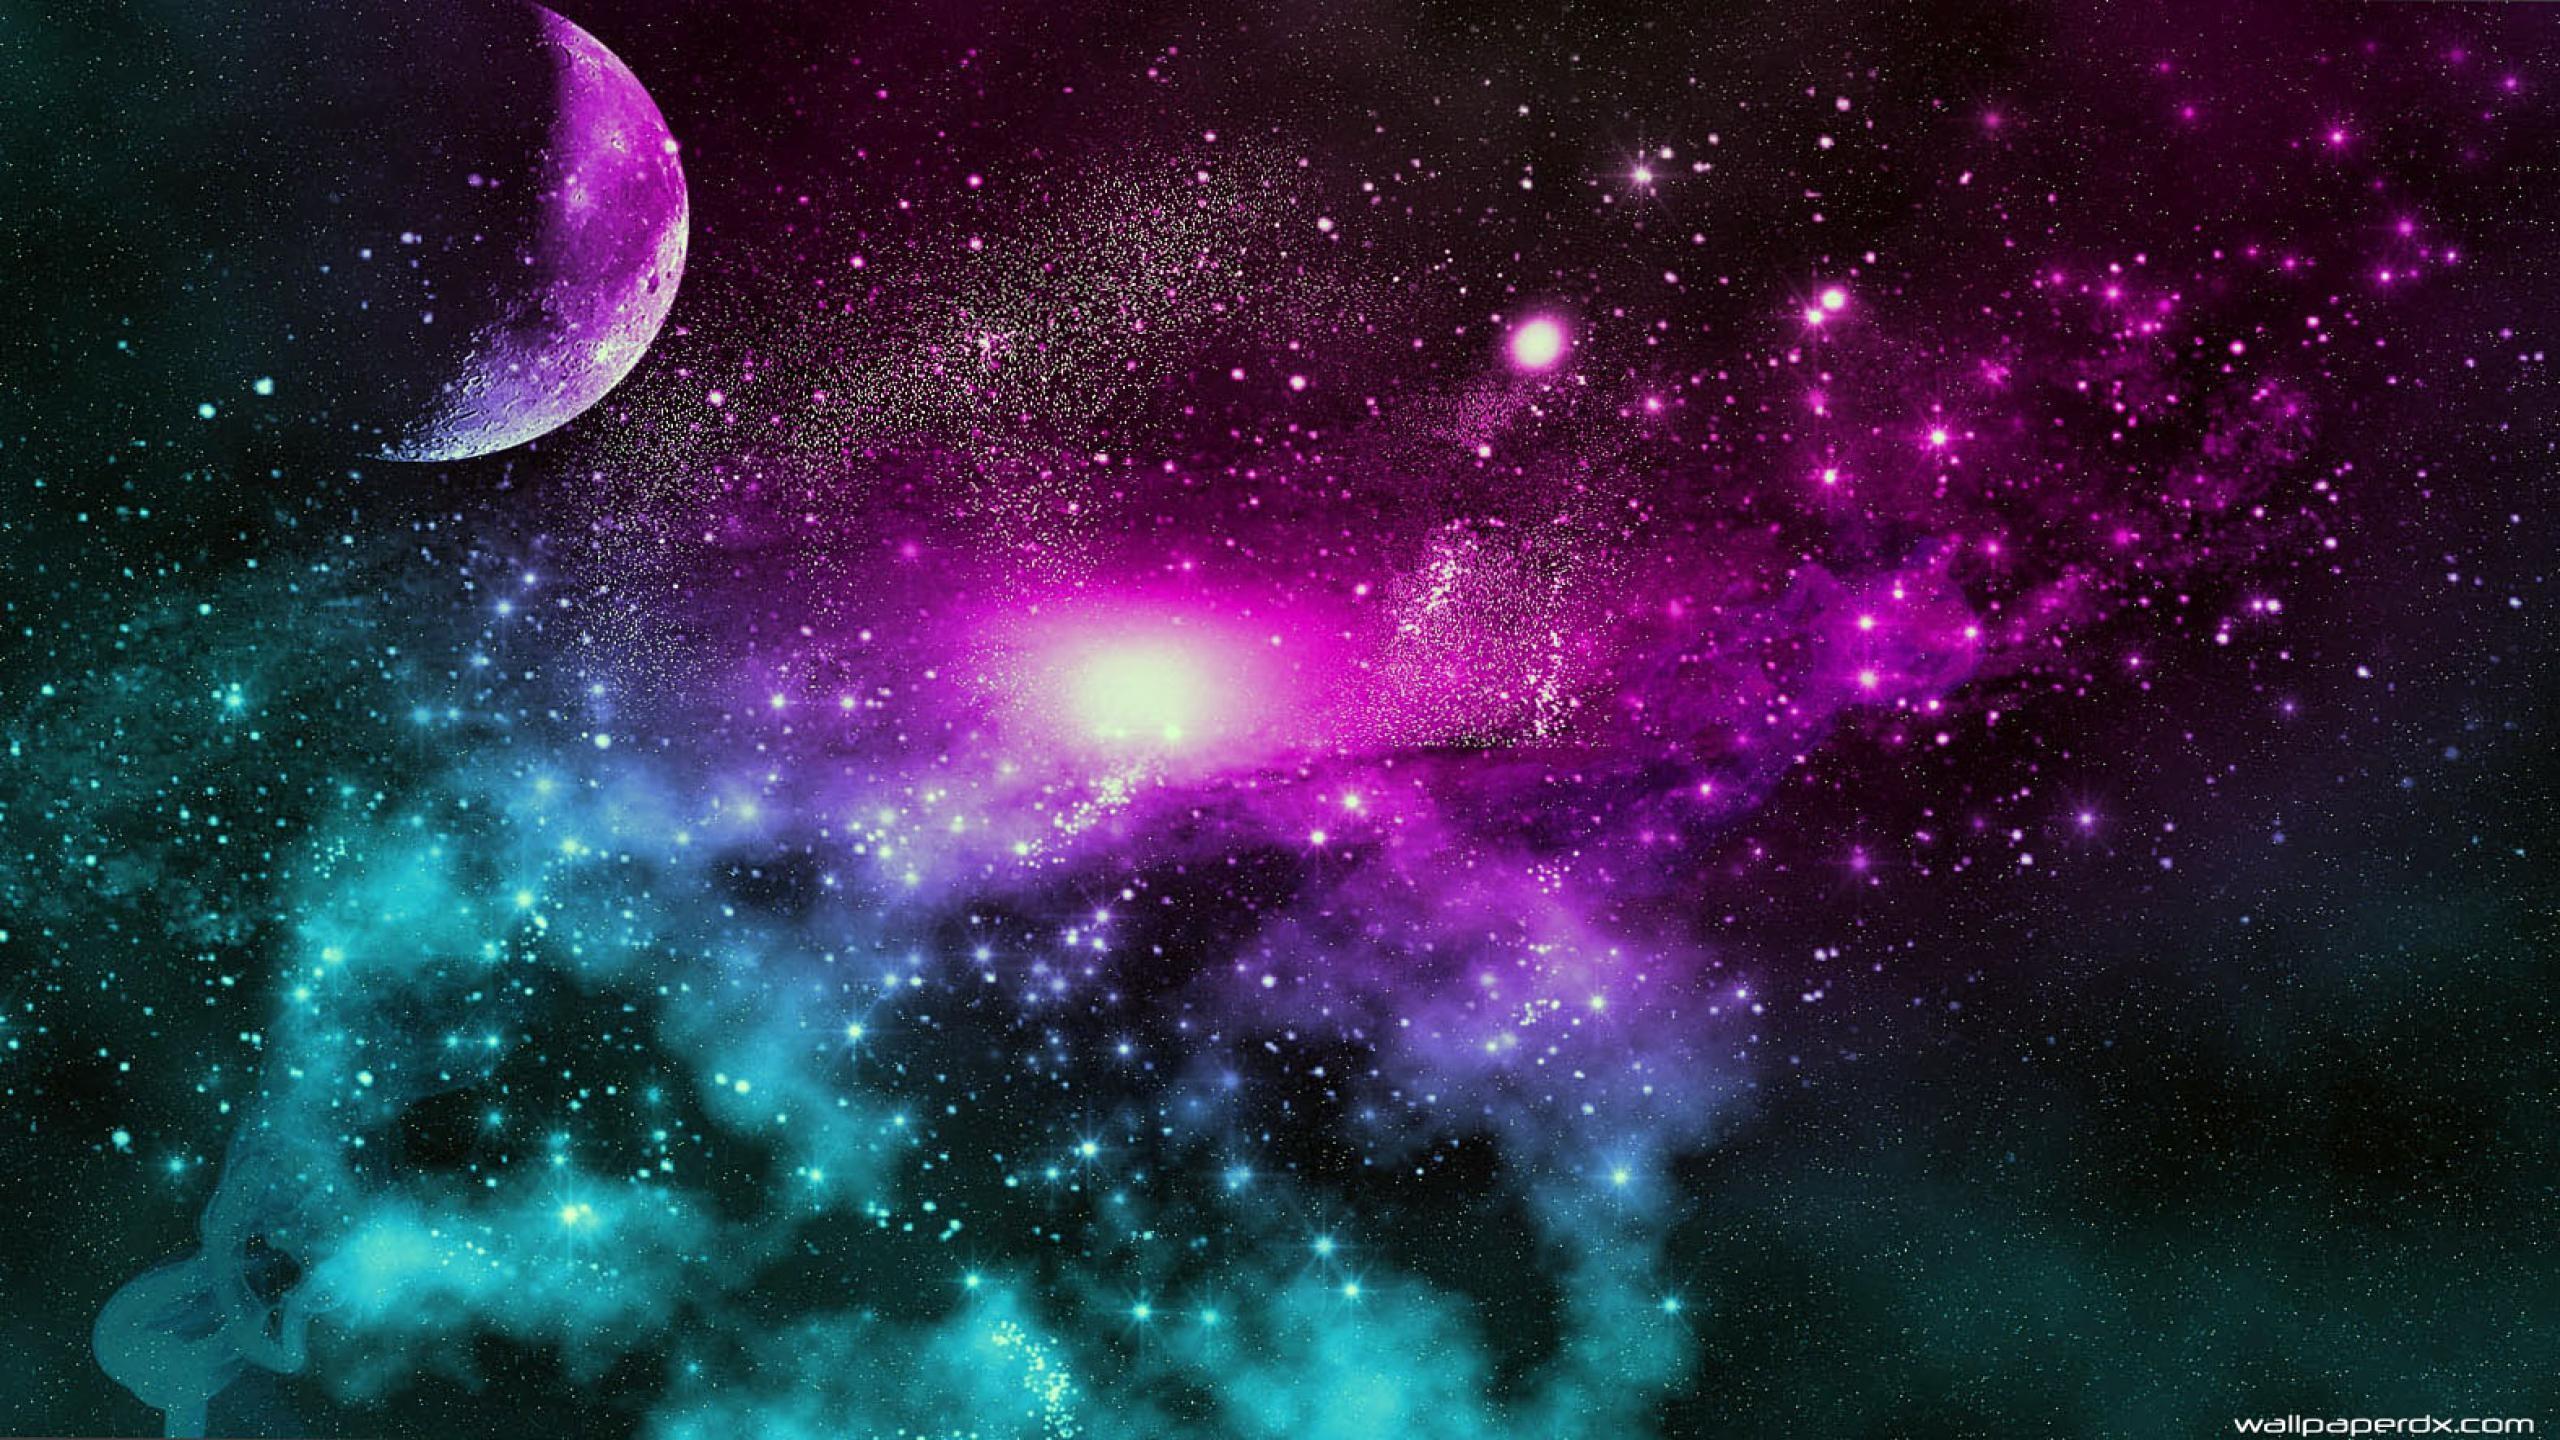 2560 X 1440 Galaxy Wallpaper 87 Images